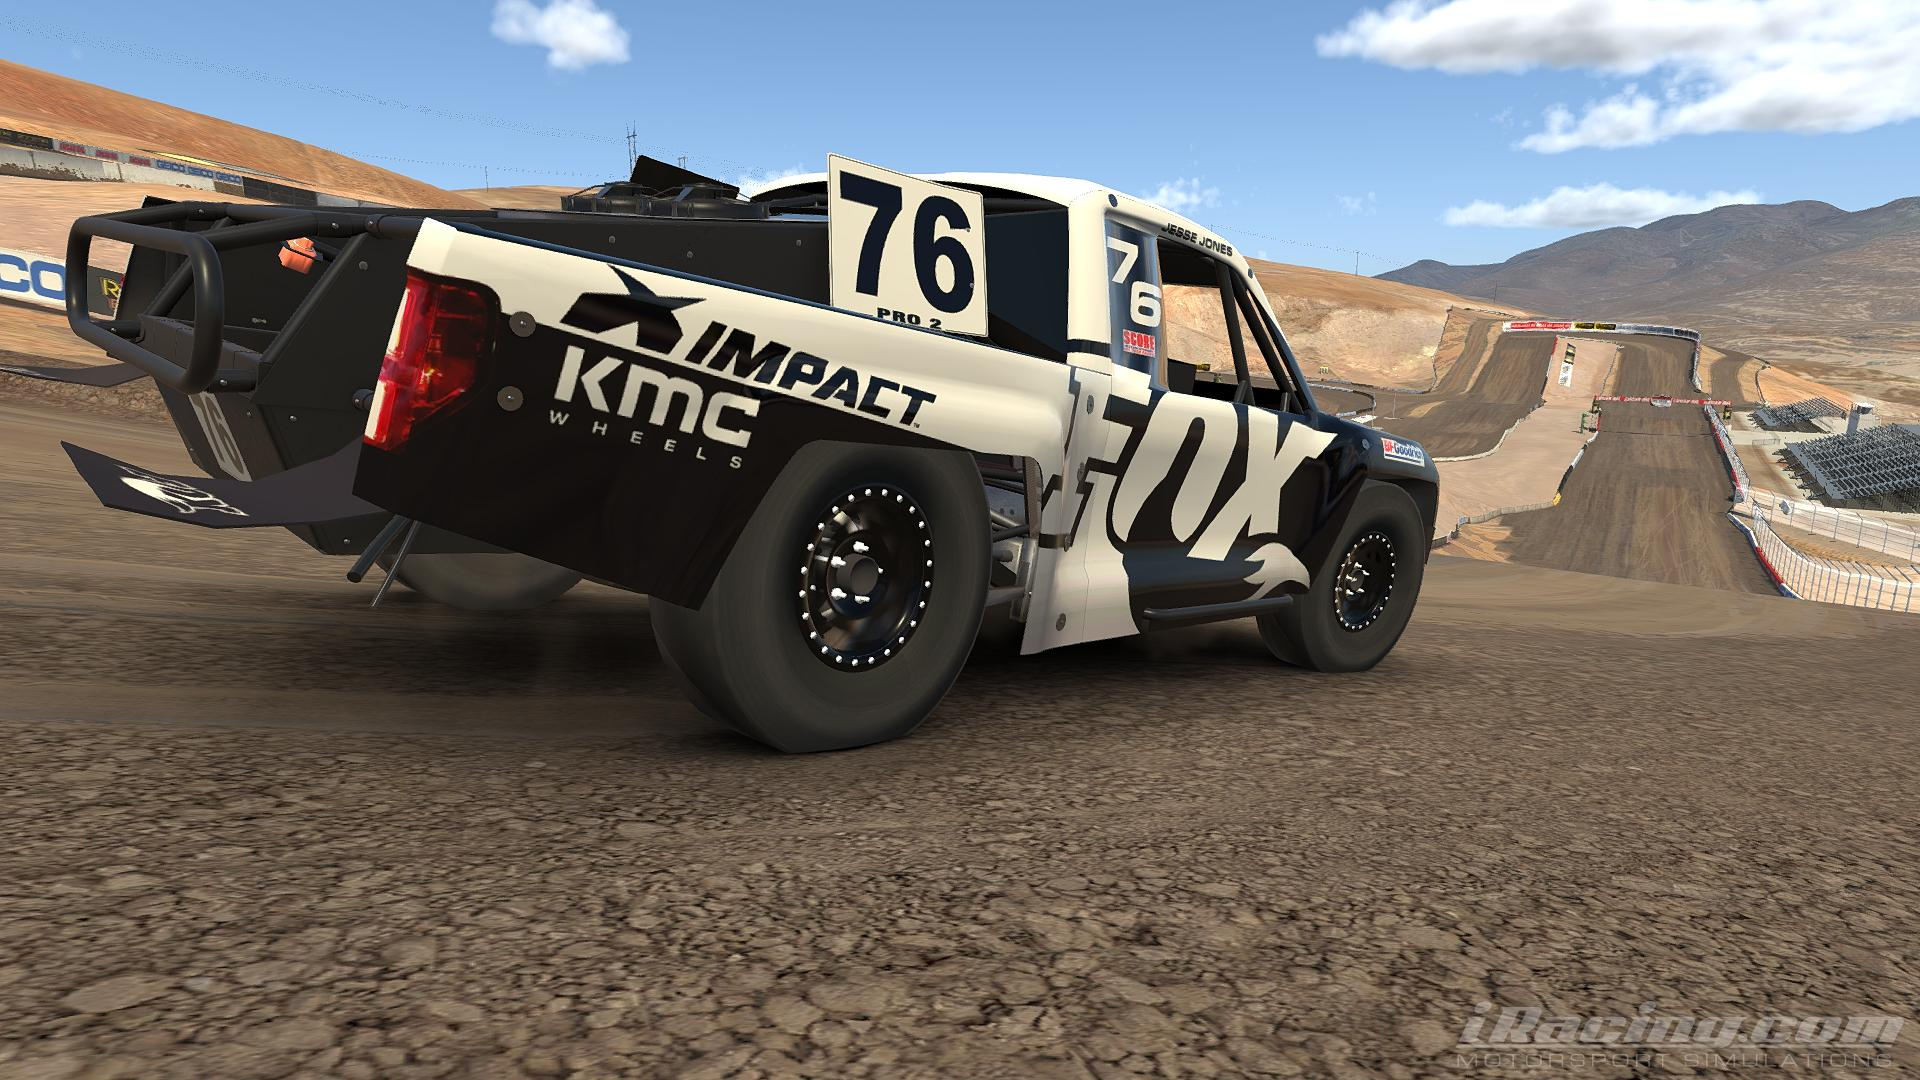 Preview of Jesse Jones Fox Racing Trophy Truck (Pro 2 Lite) by Steve Ficacci